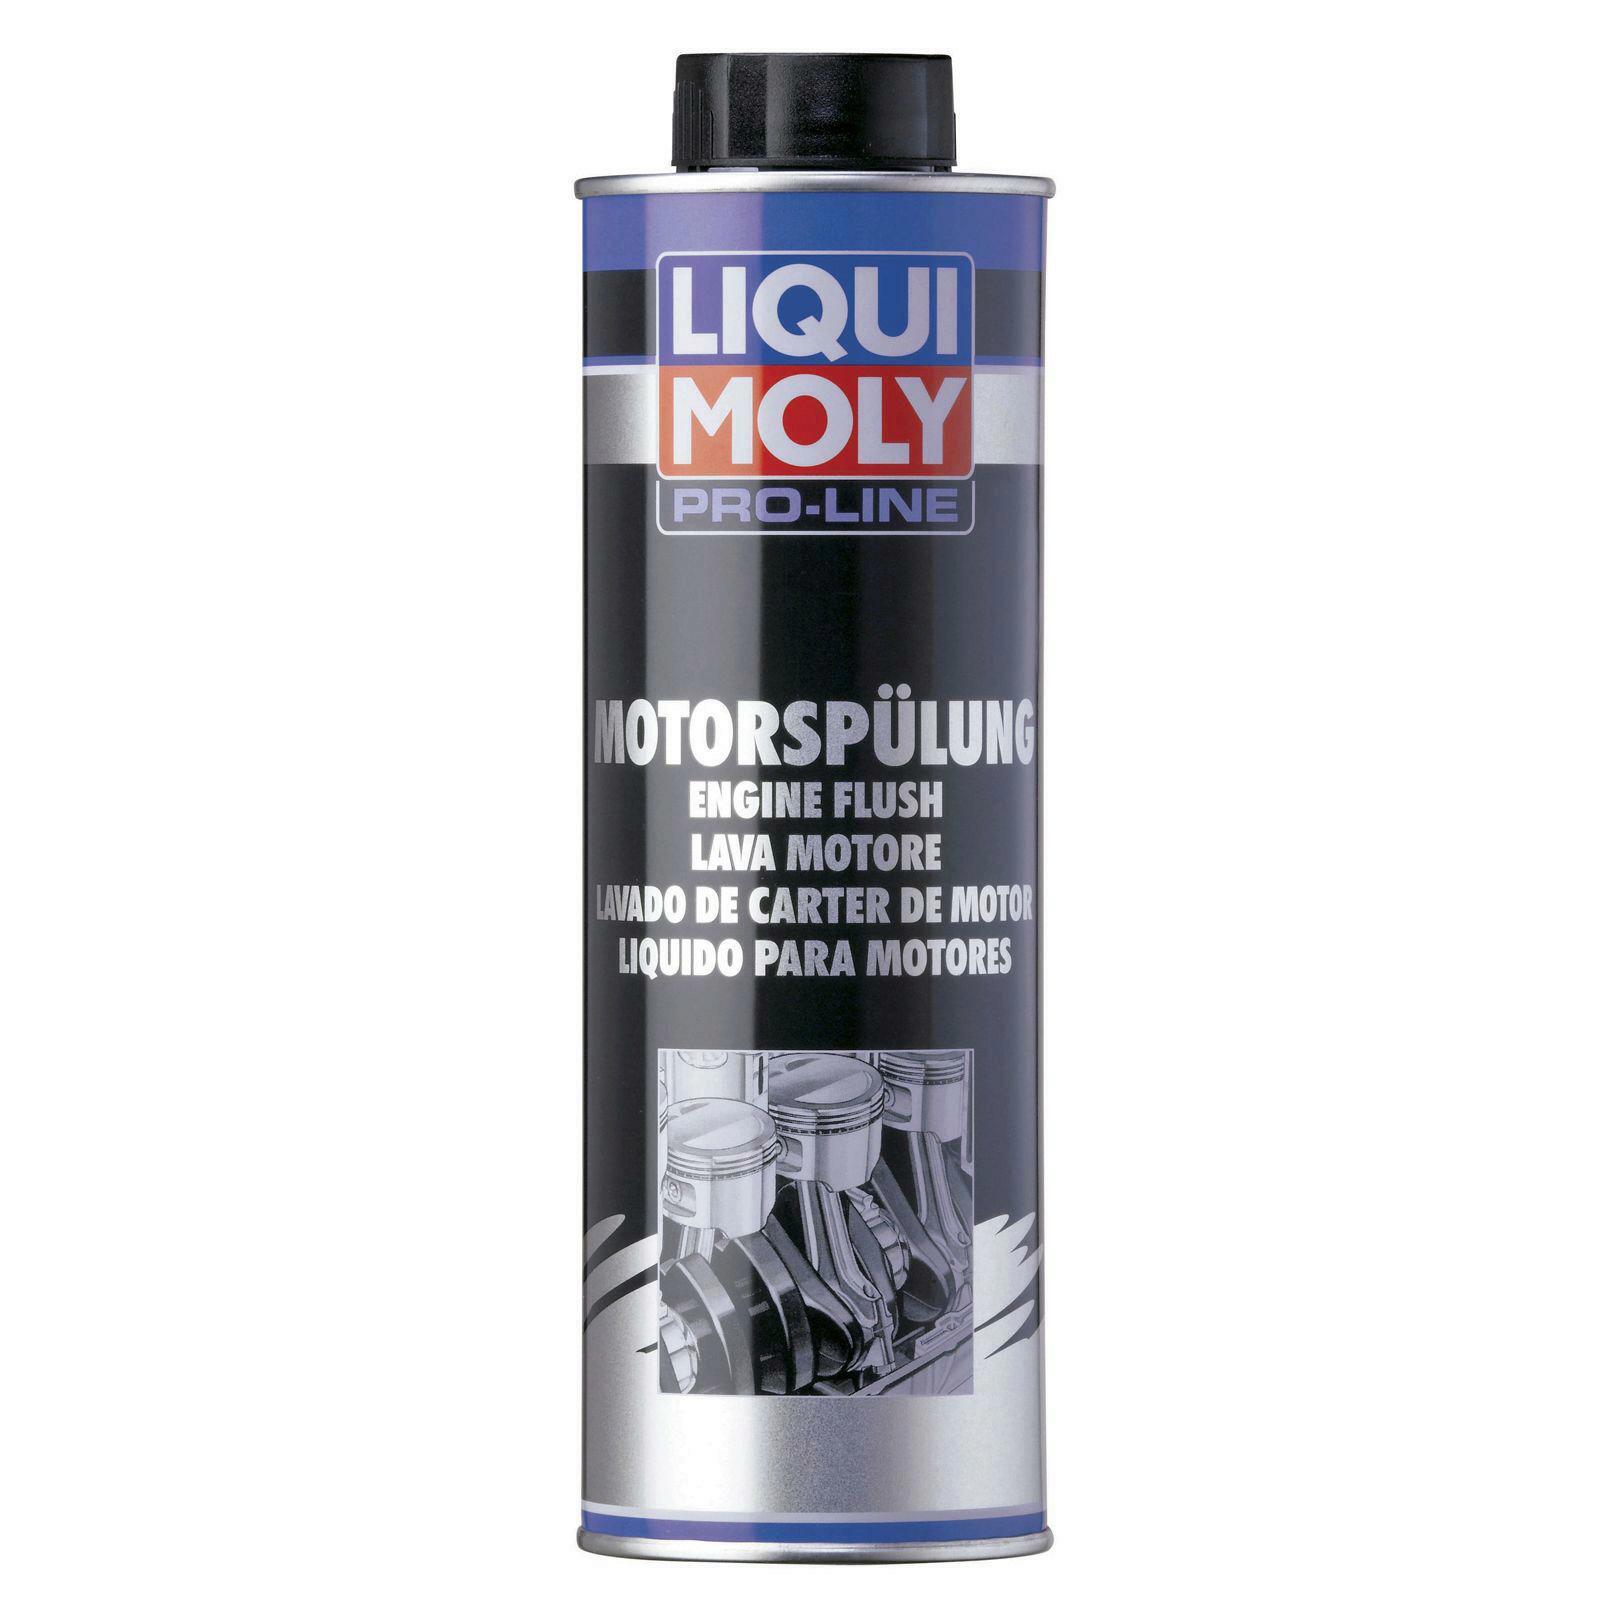 Liqui Moly Pro-Line Motorspülung 500ml